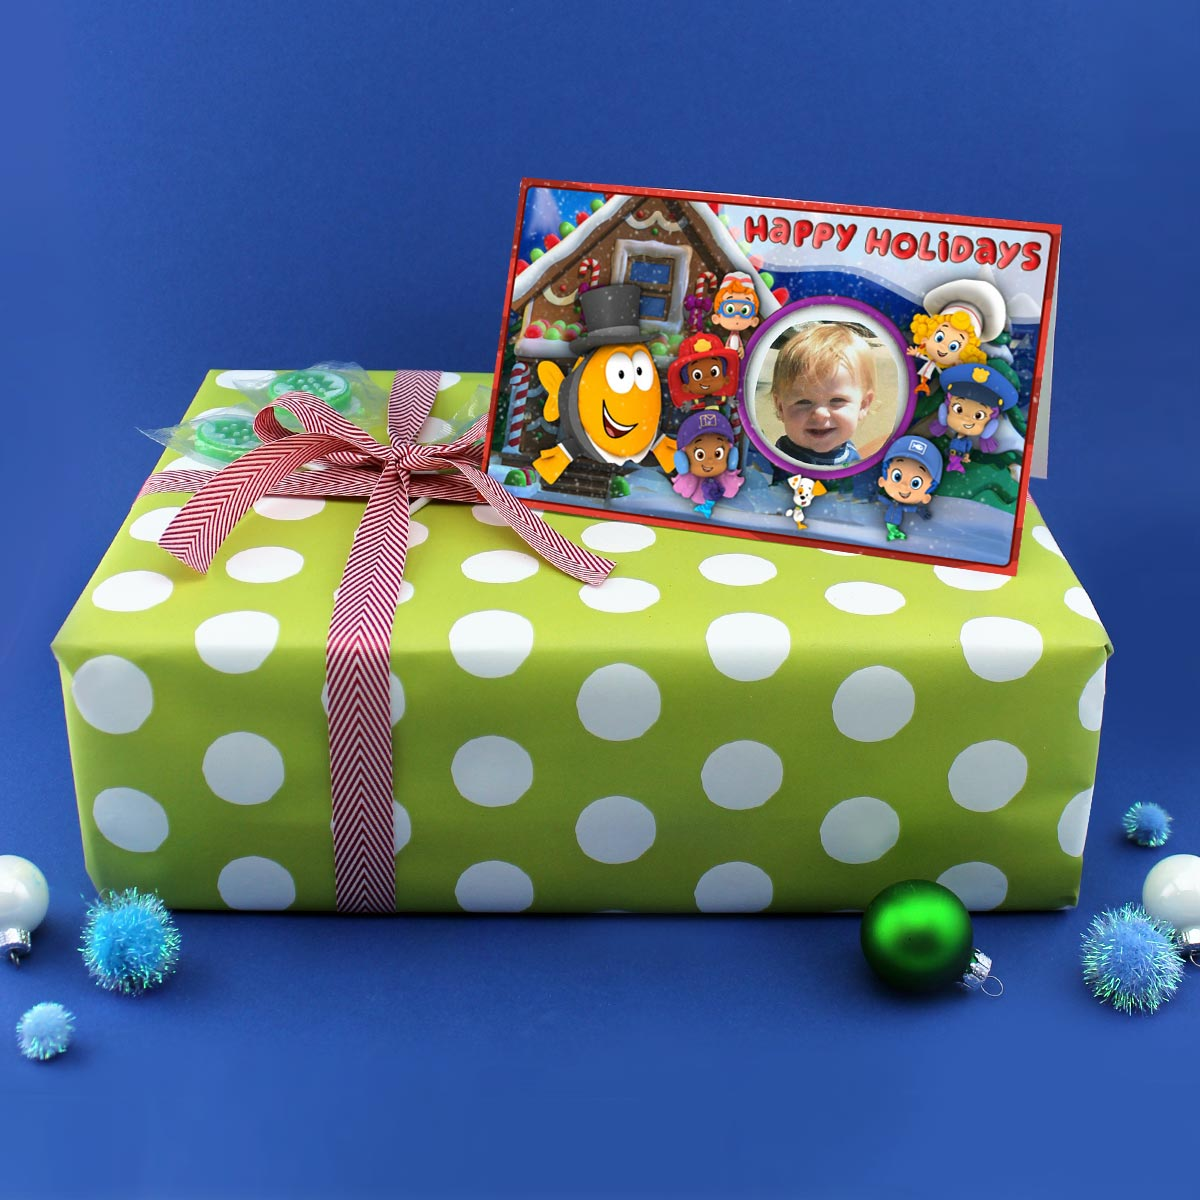 Bubble Guppies Holiday Card